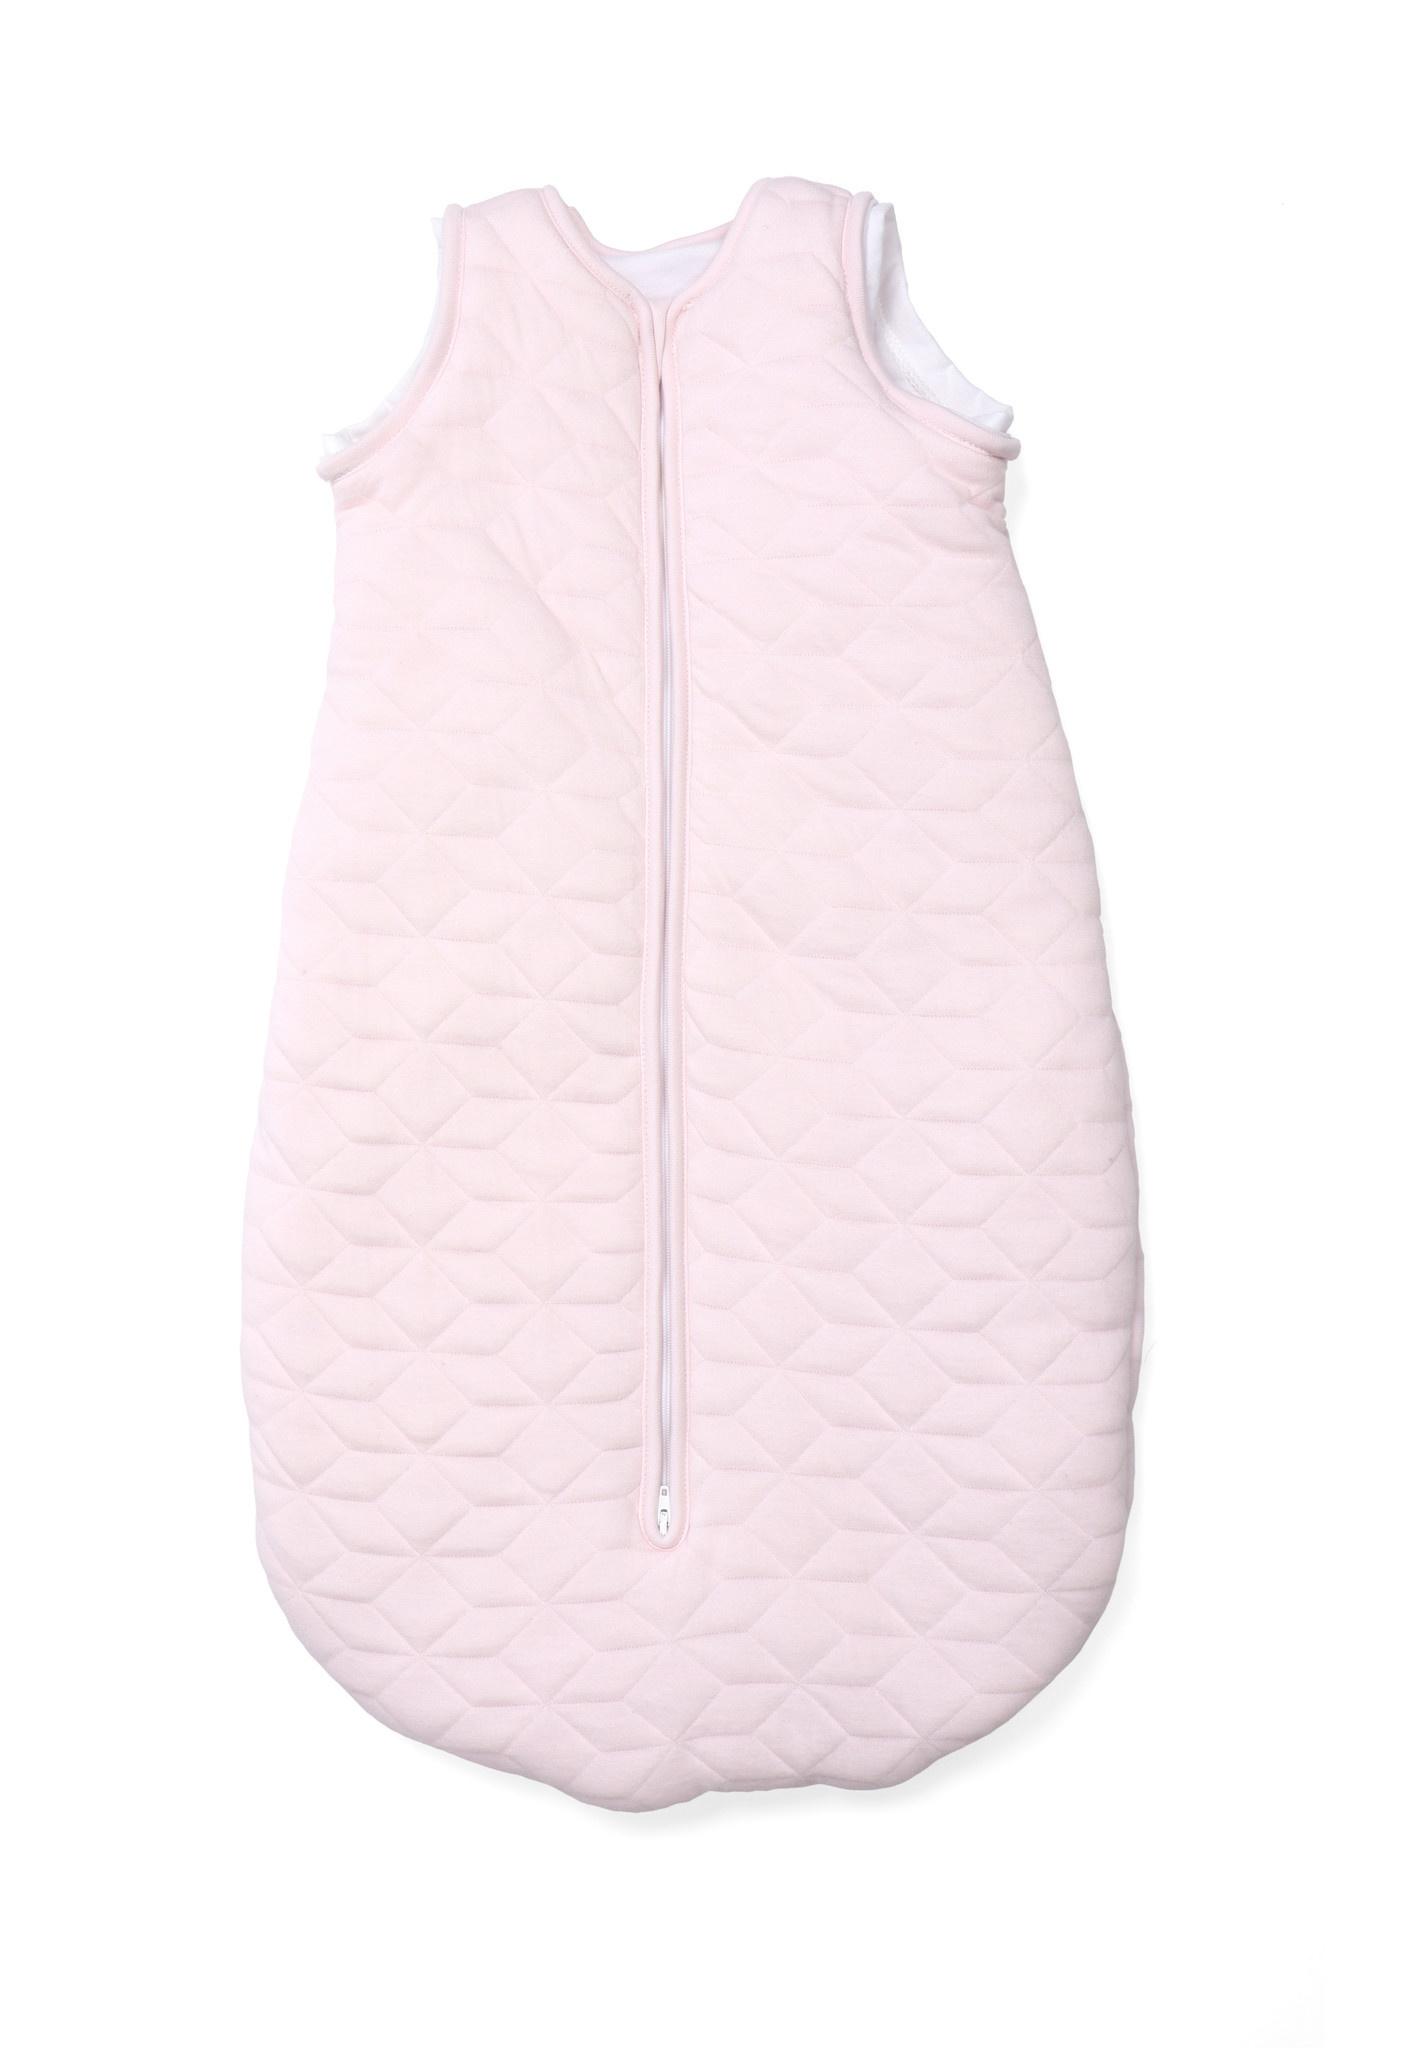 Jersey slaapzak 70cm met afritsbare mouwen Star Soft Pink-9